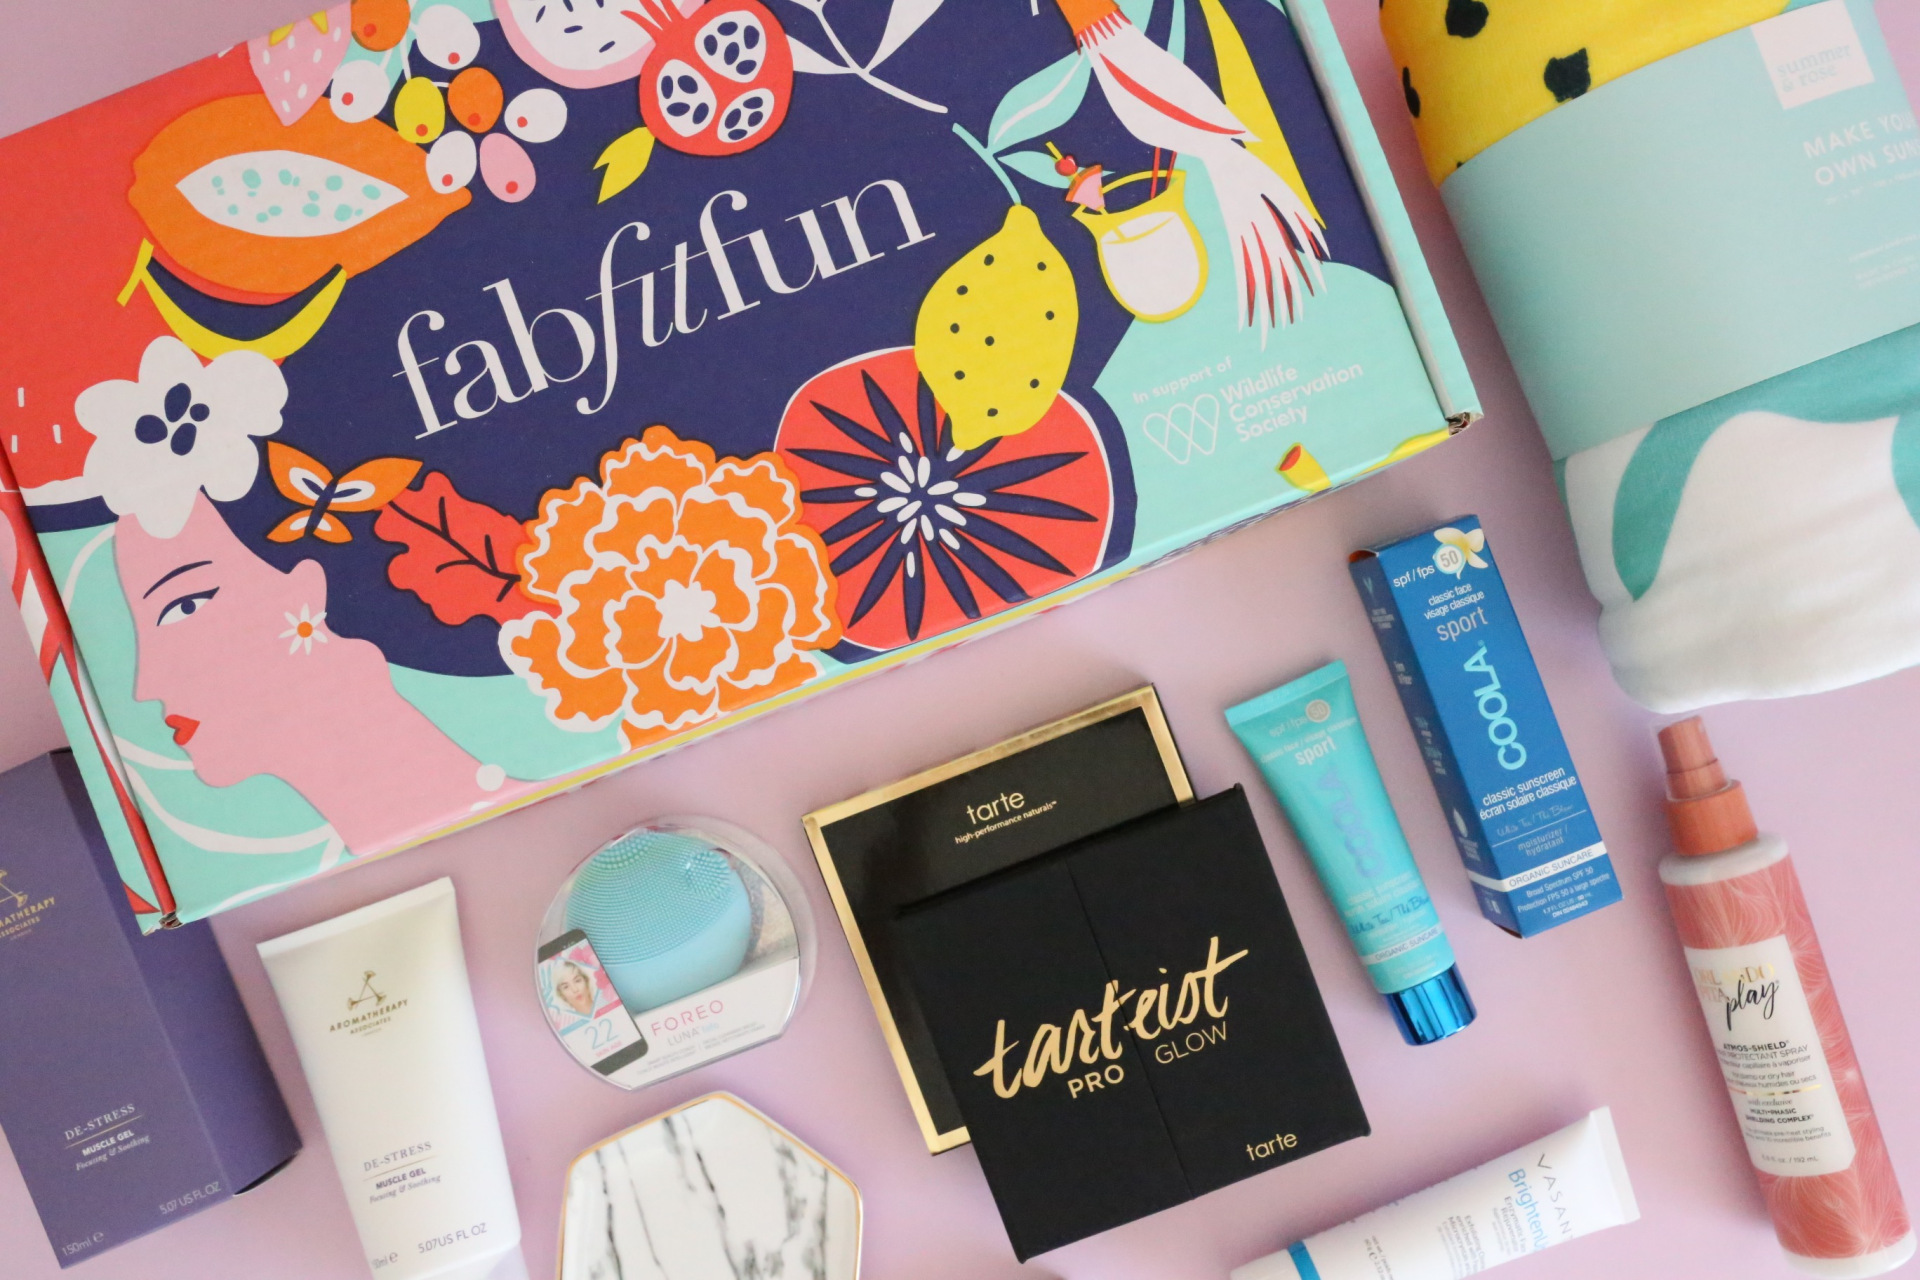 FabFitFun-Review-Summer-2018-9.jpg